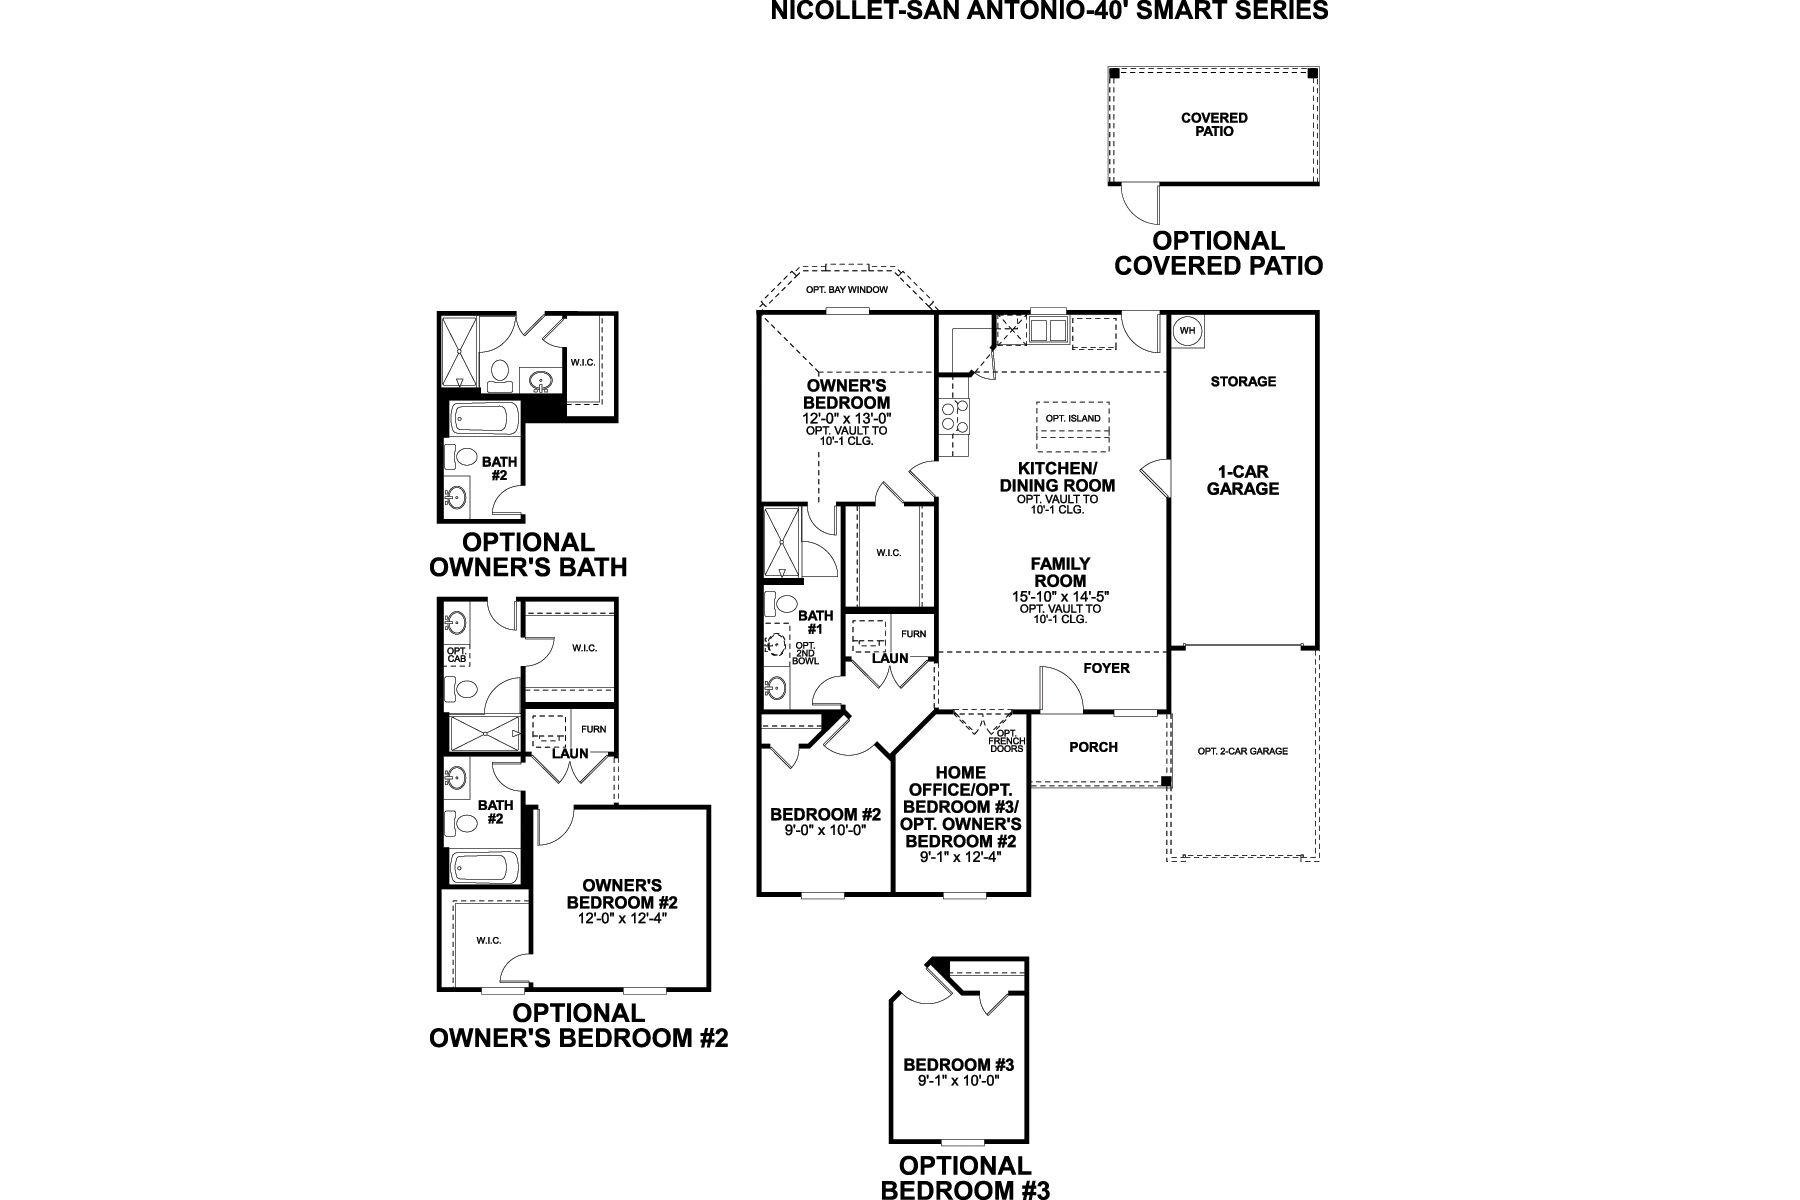 Nicollet Floorplan